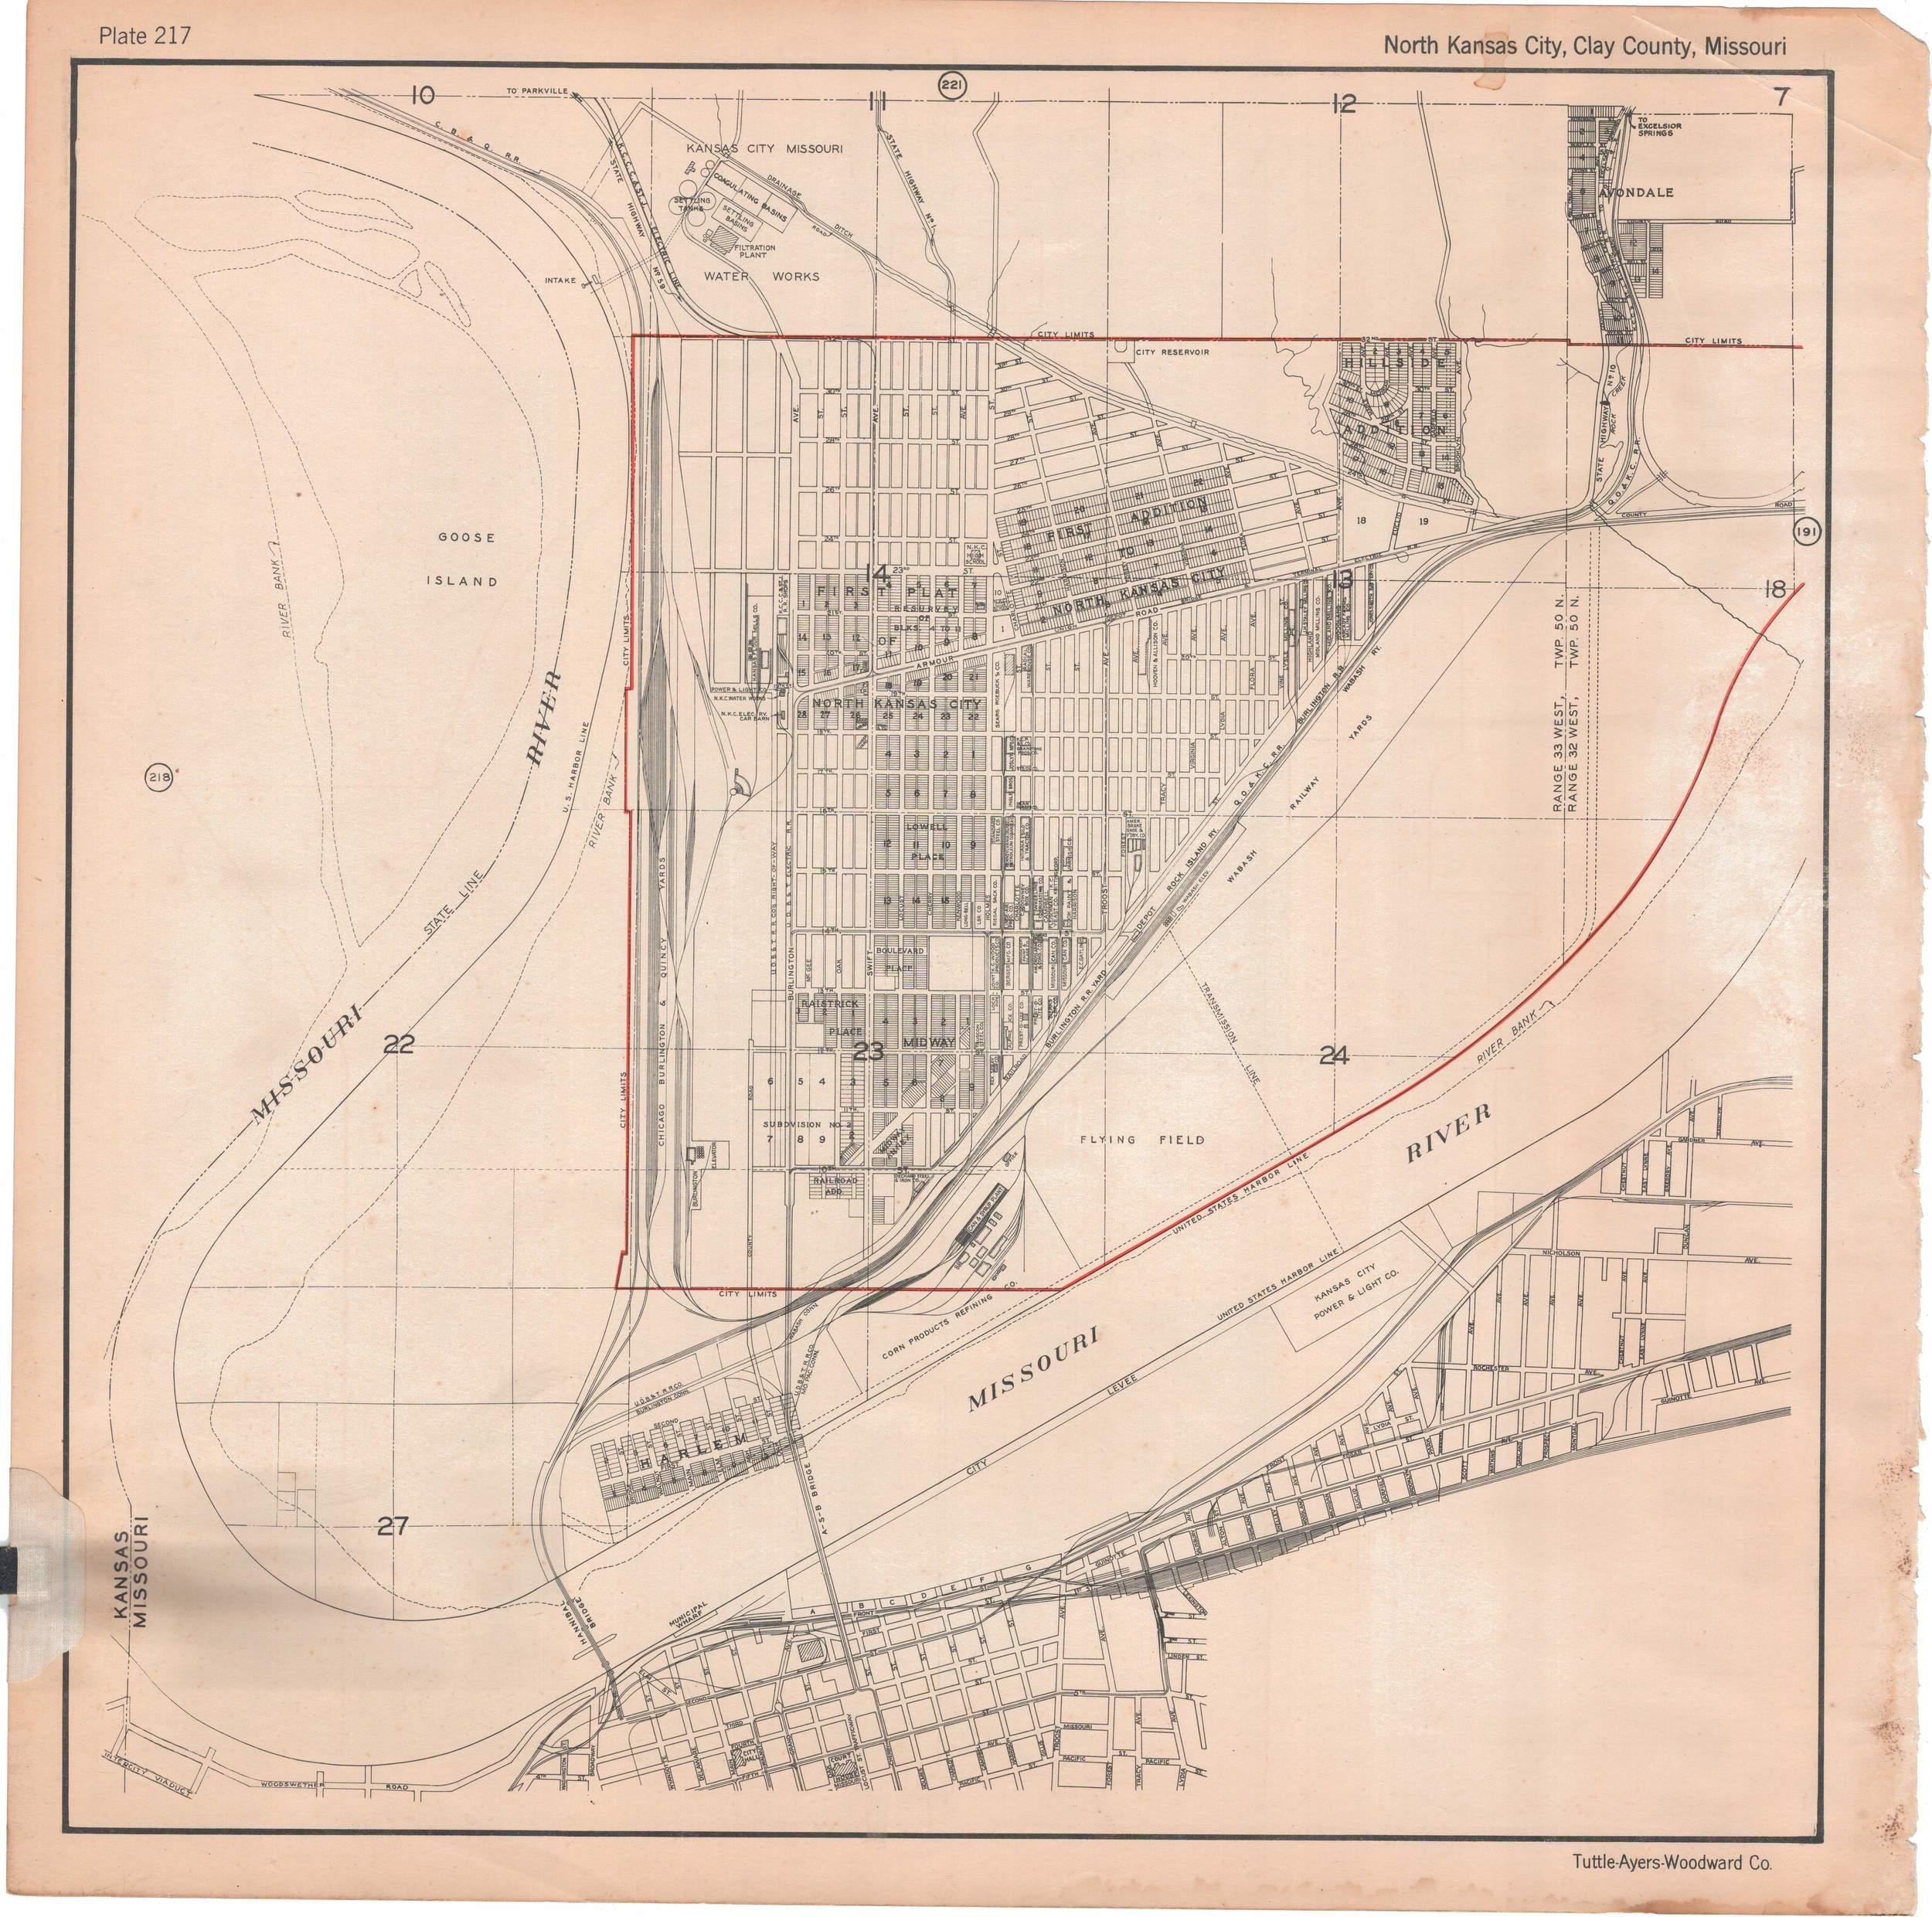 1925 TUTTLE_AYERS_Plate_217.JPG